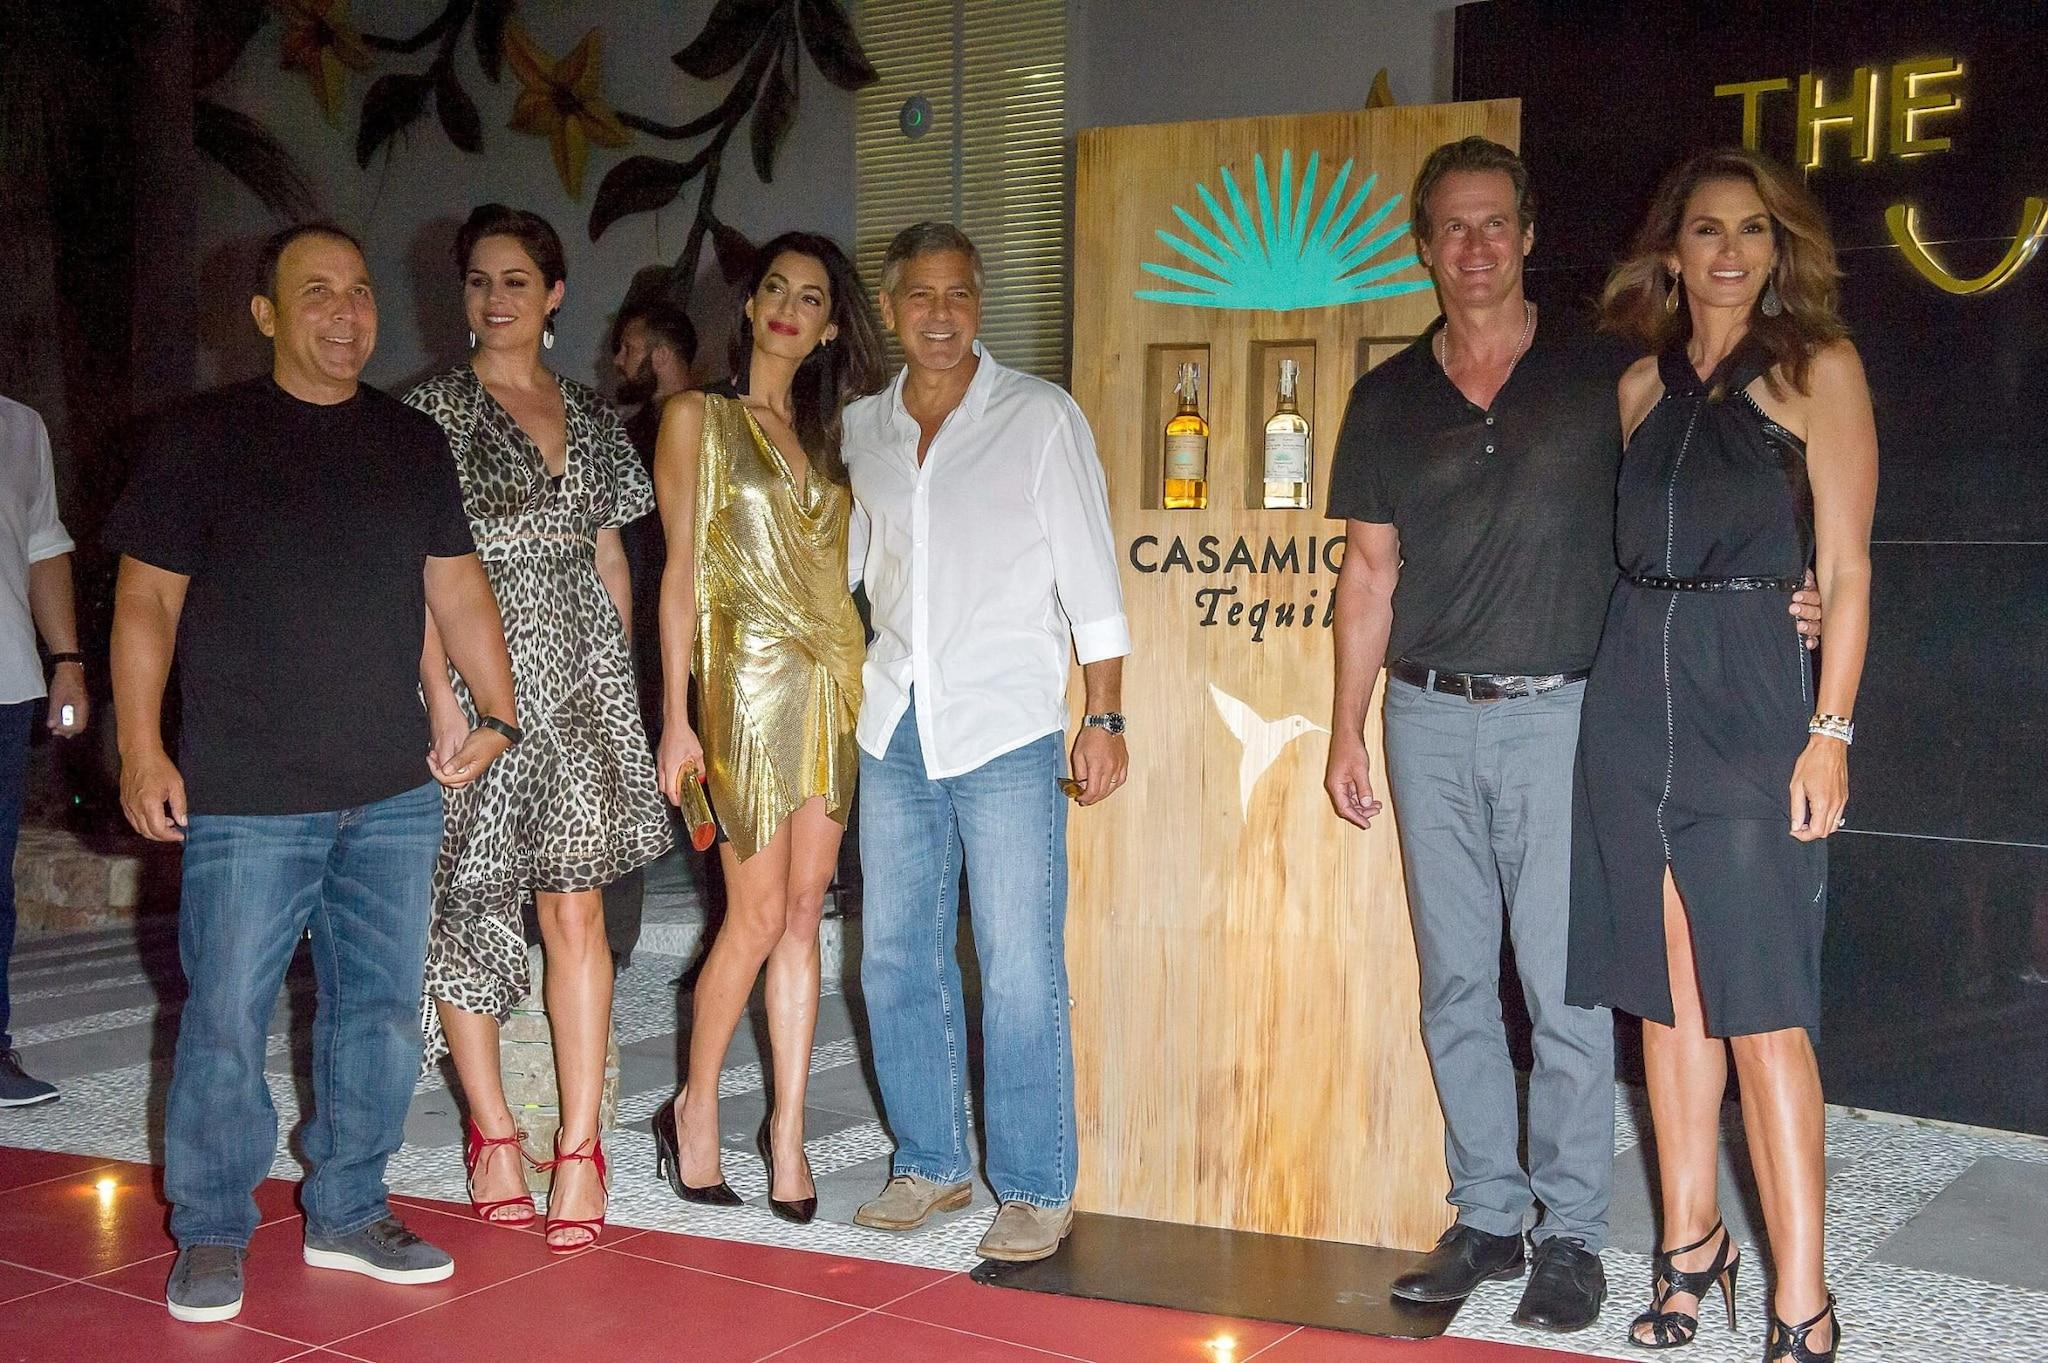 I fondatori di Casamigos e consorti:Mike Meldman e la moglie, George Clooney e Amal Alamuddin, Rande Gerber e Cindy Crawford